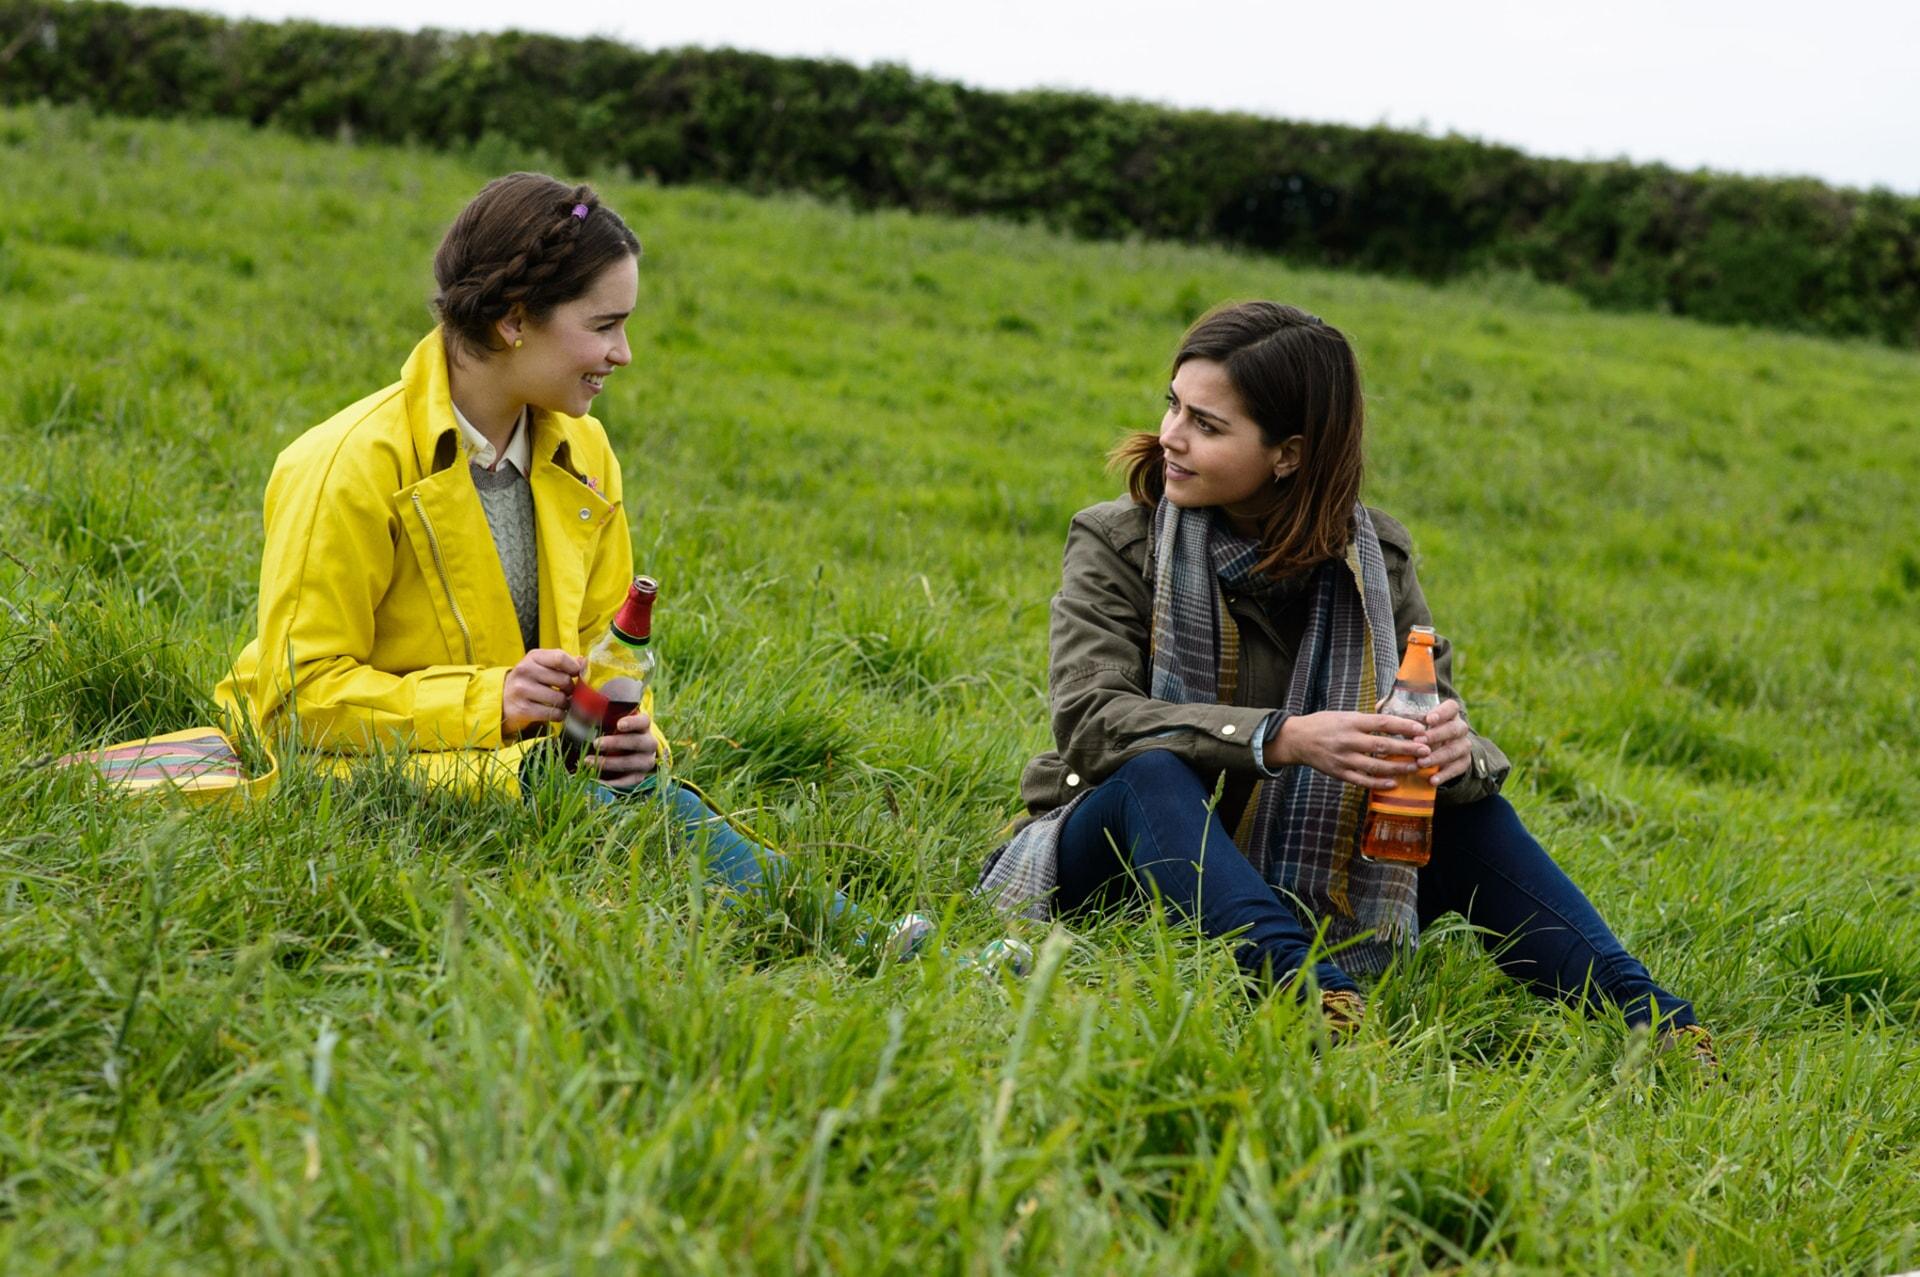 EMILIA CLARKE as Lou Clark and JENNA COLEMAN as Katrina Clark sitting on a grassy hillside and talking.